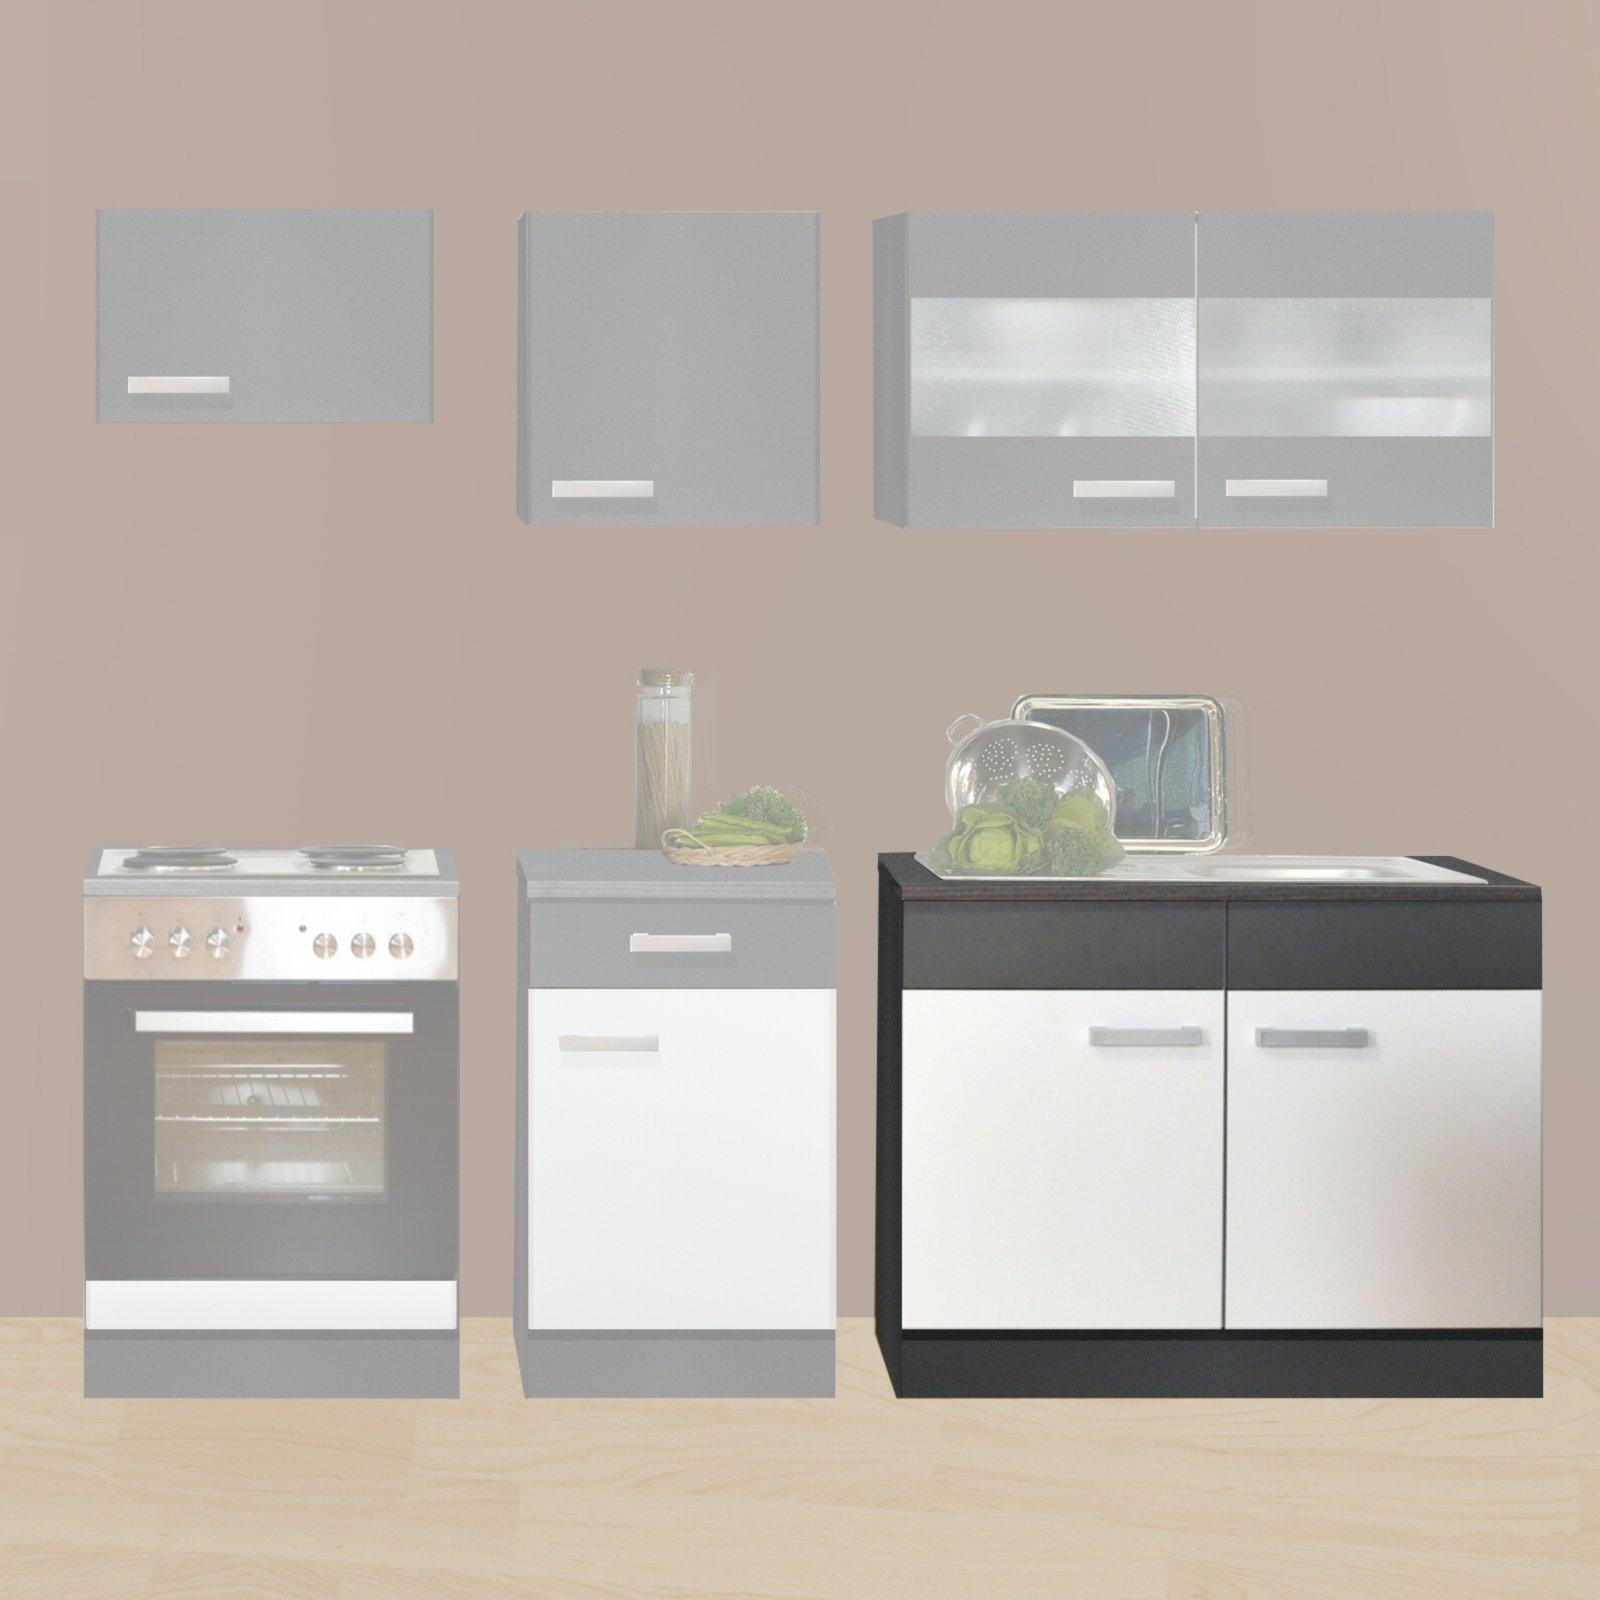 sp lenunterschrank geschirrsp ler sp lenschrank mit integriertem geschirrsp ler. Black Bedroom Furniture Sets. Home Design Ideas